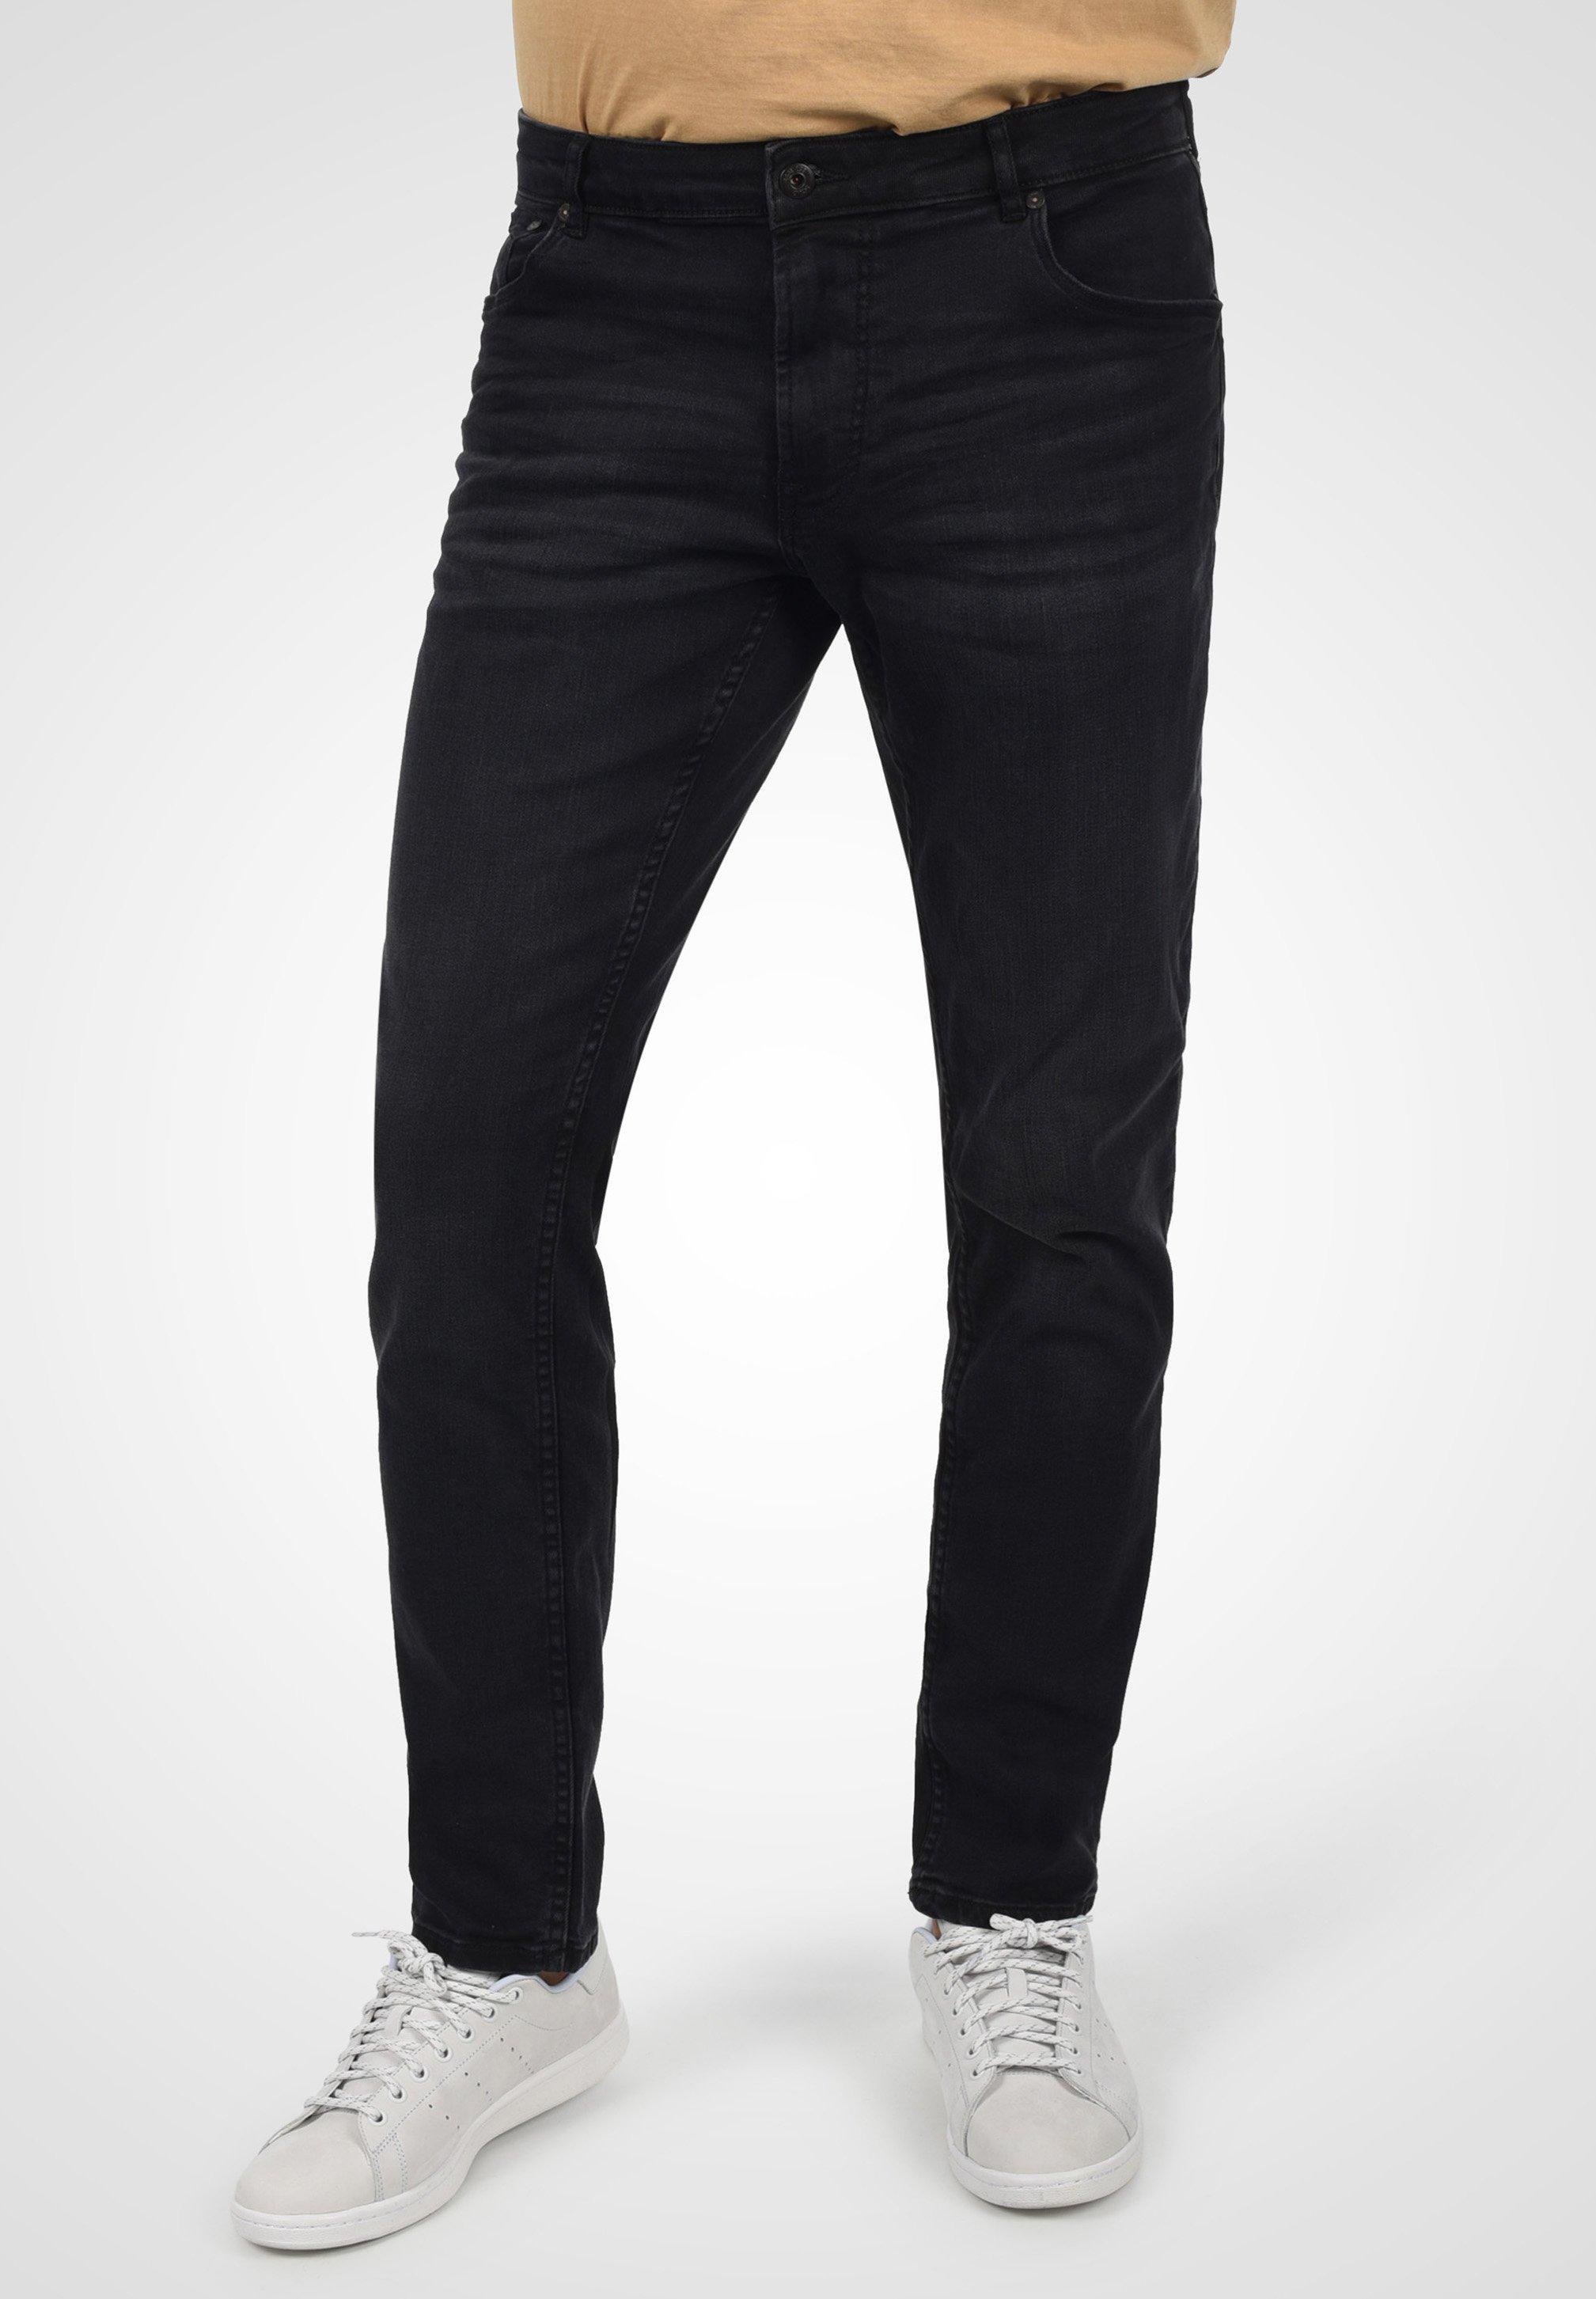 Uomo SLIM-JOY BLUE258 STR - Jeans slim fit